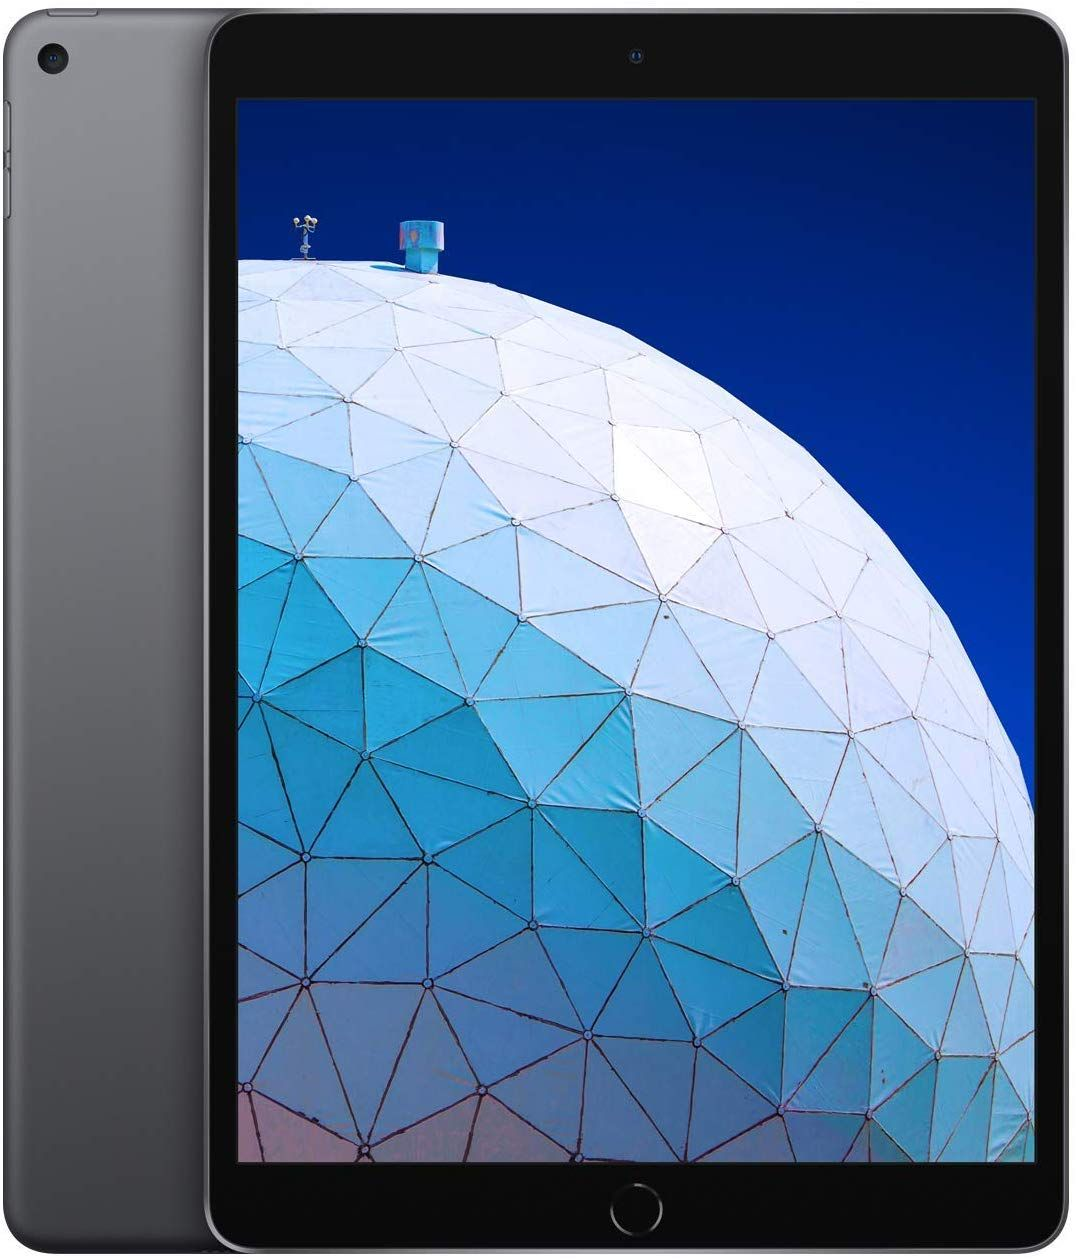 Apple Ipad Air 10 5 Inch Wi Fi Cellular 64gb Space Gray Ipad Air Apple Ipad Apple Ipad Air